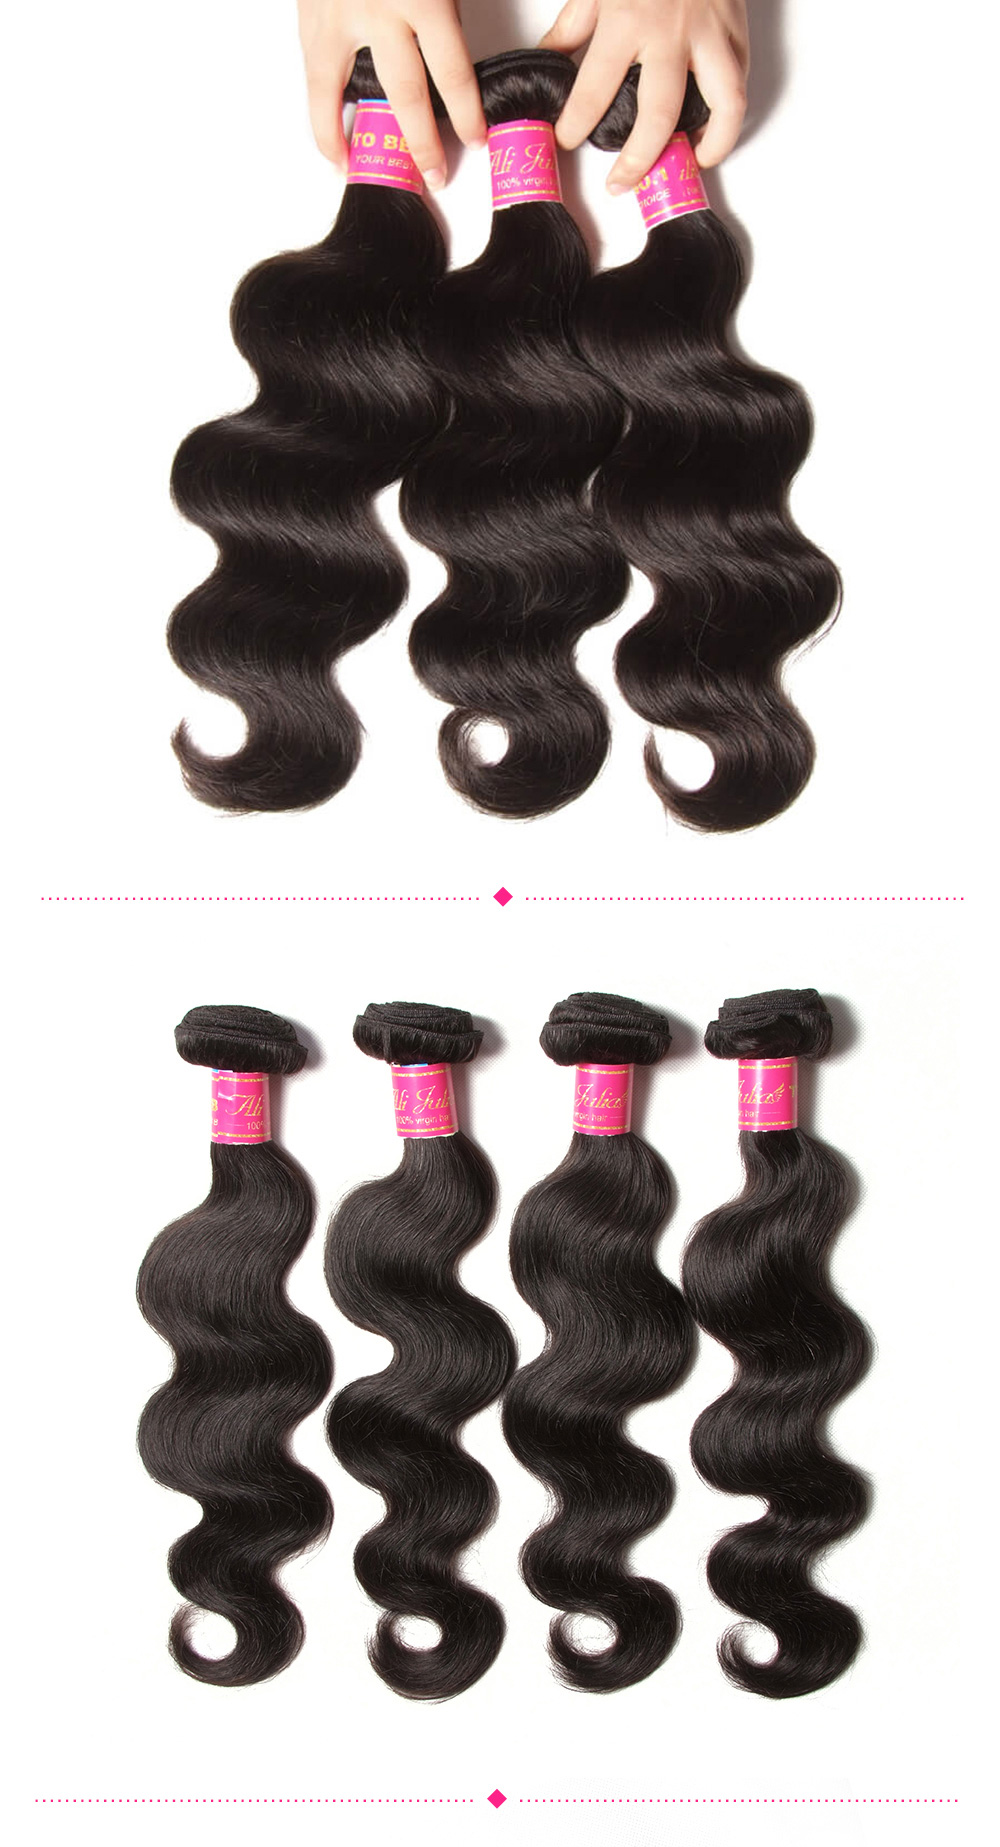 Virgin Brazilian body wave hair bundles with lace closure